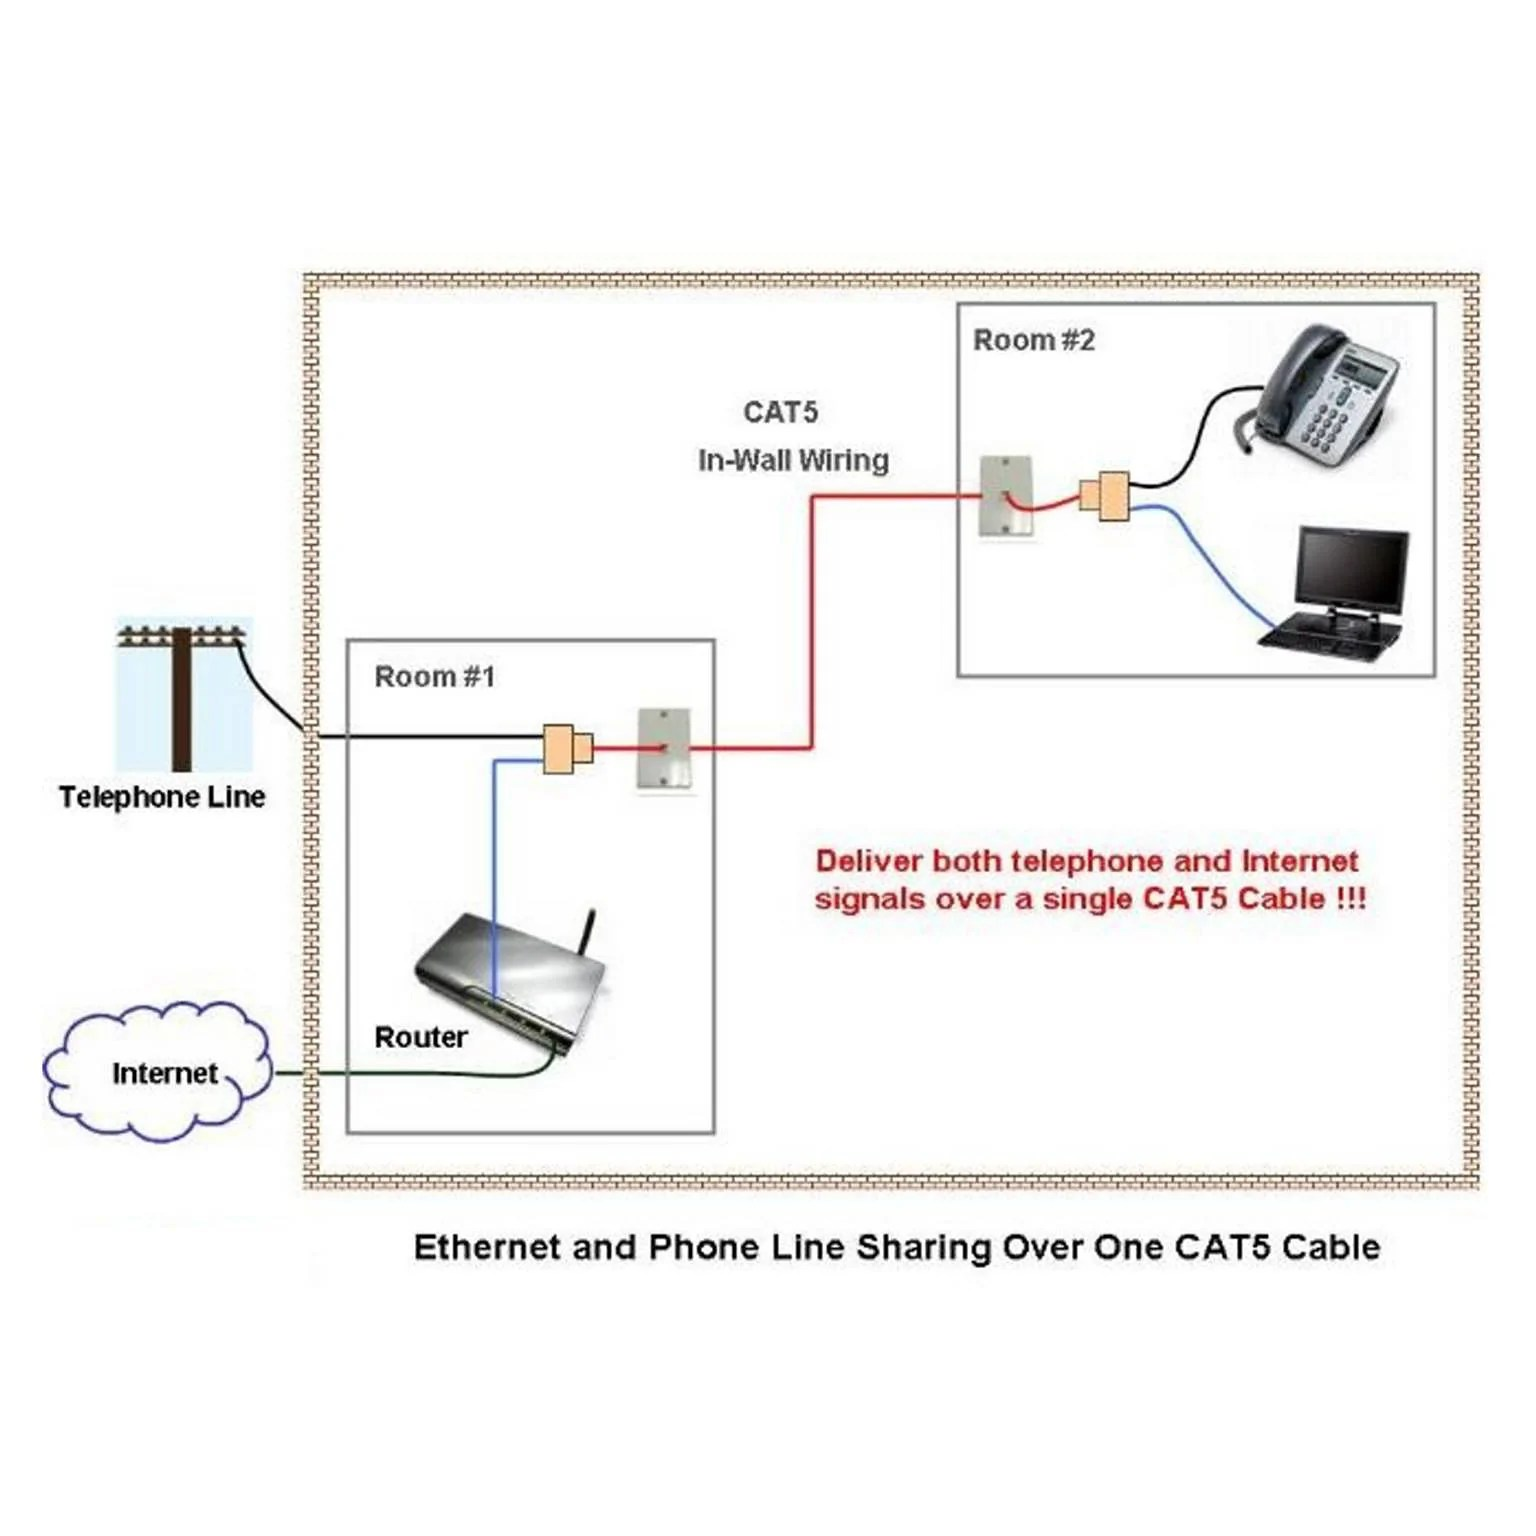 medium resolution of ethernet phone wiring diagram wiring diagram ameethernet phone wiring diagram wiring diagram fascinating ethernet phone wiring